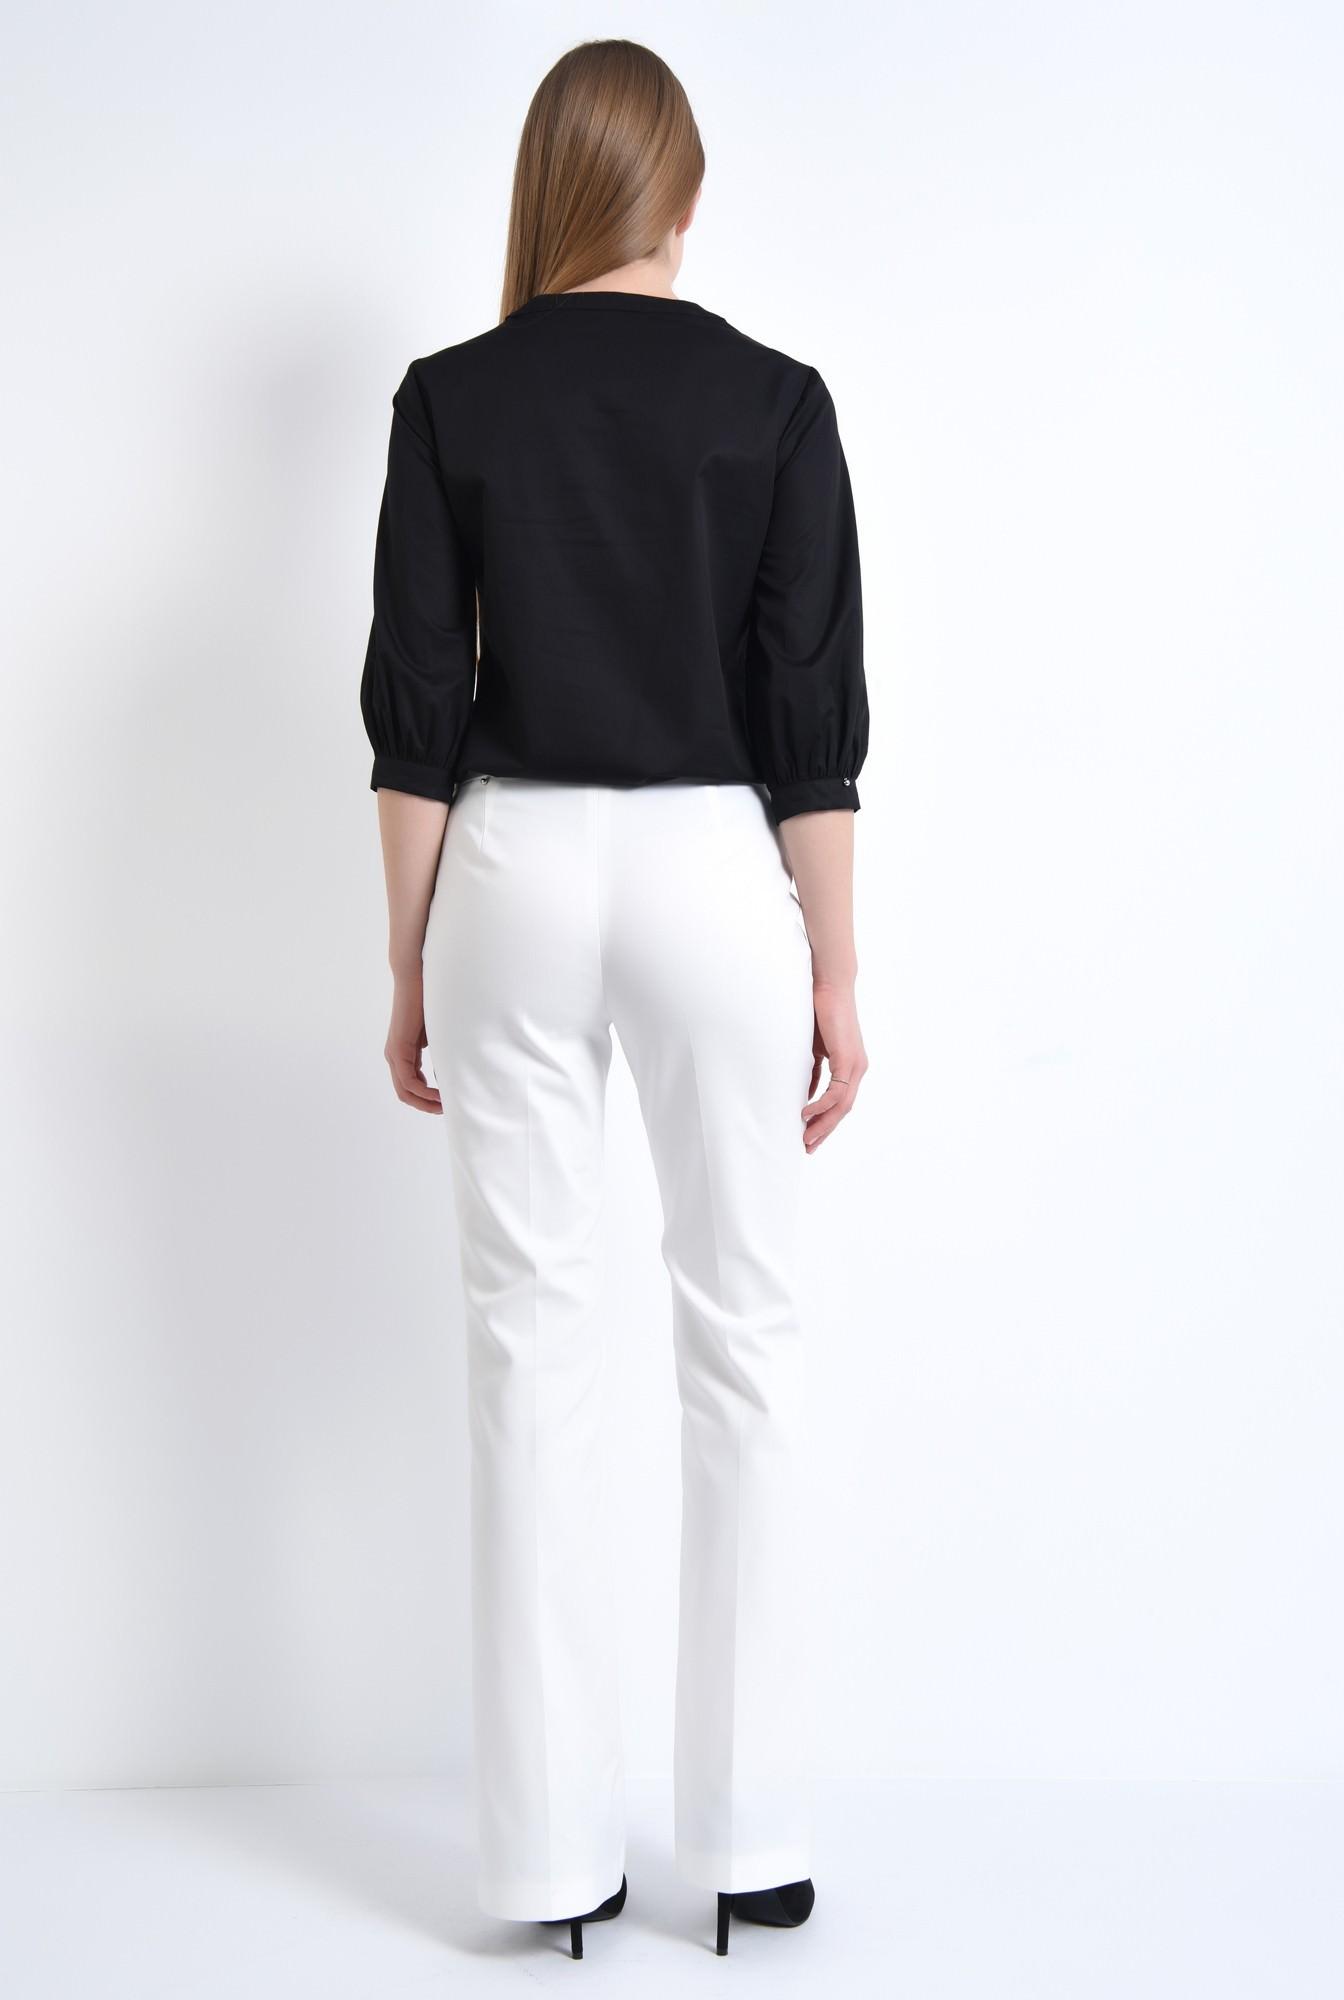 1 - Bluza casual, negru, bumbac, maneci midi